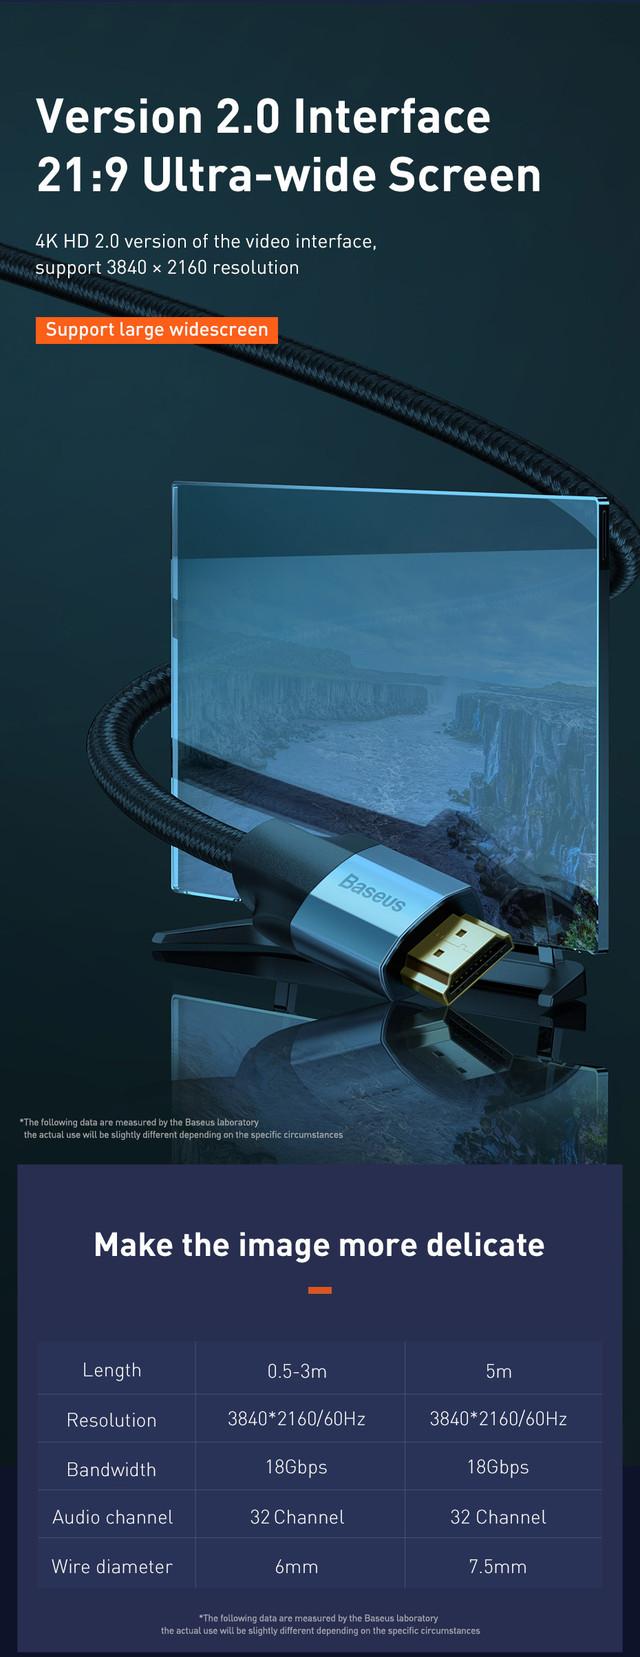 HDMI кабель Baseus CAKSX с поддержкой FullHD/4K video resolution 0.5м / 1м / 2м / 3м / 5м